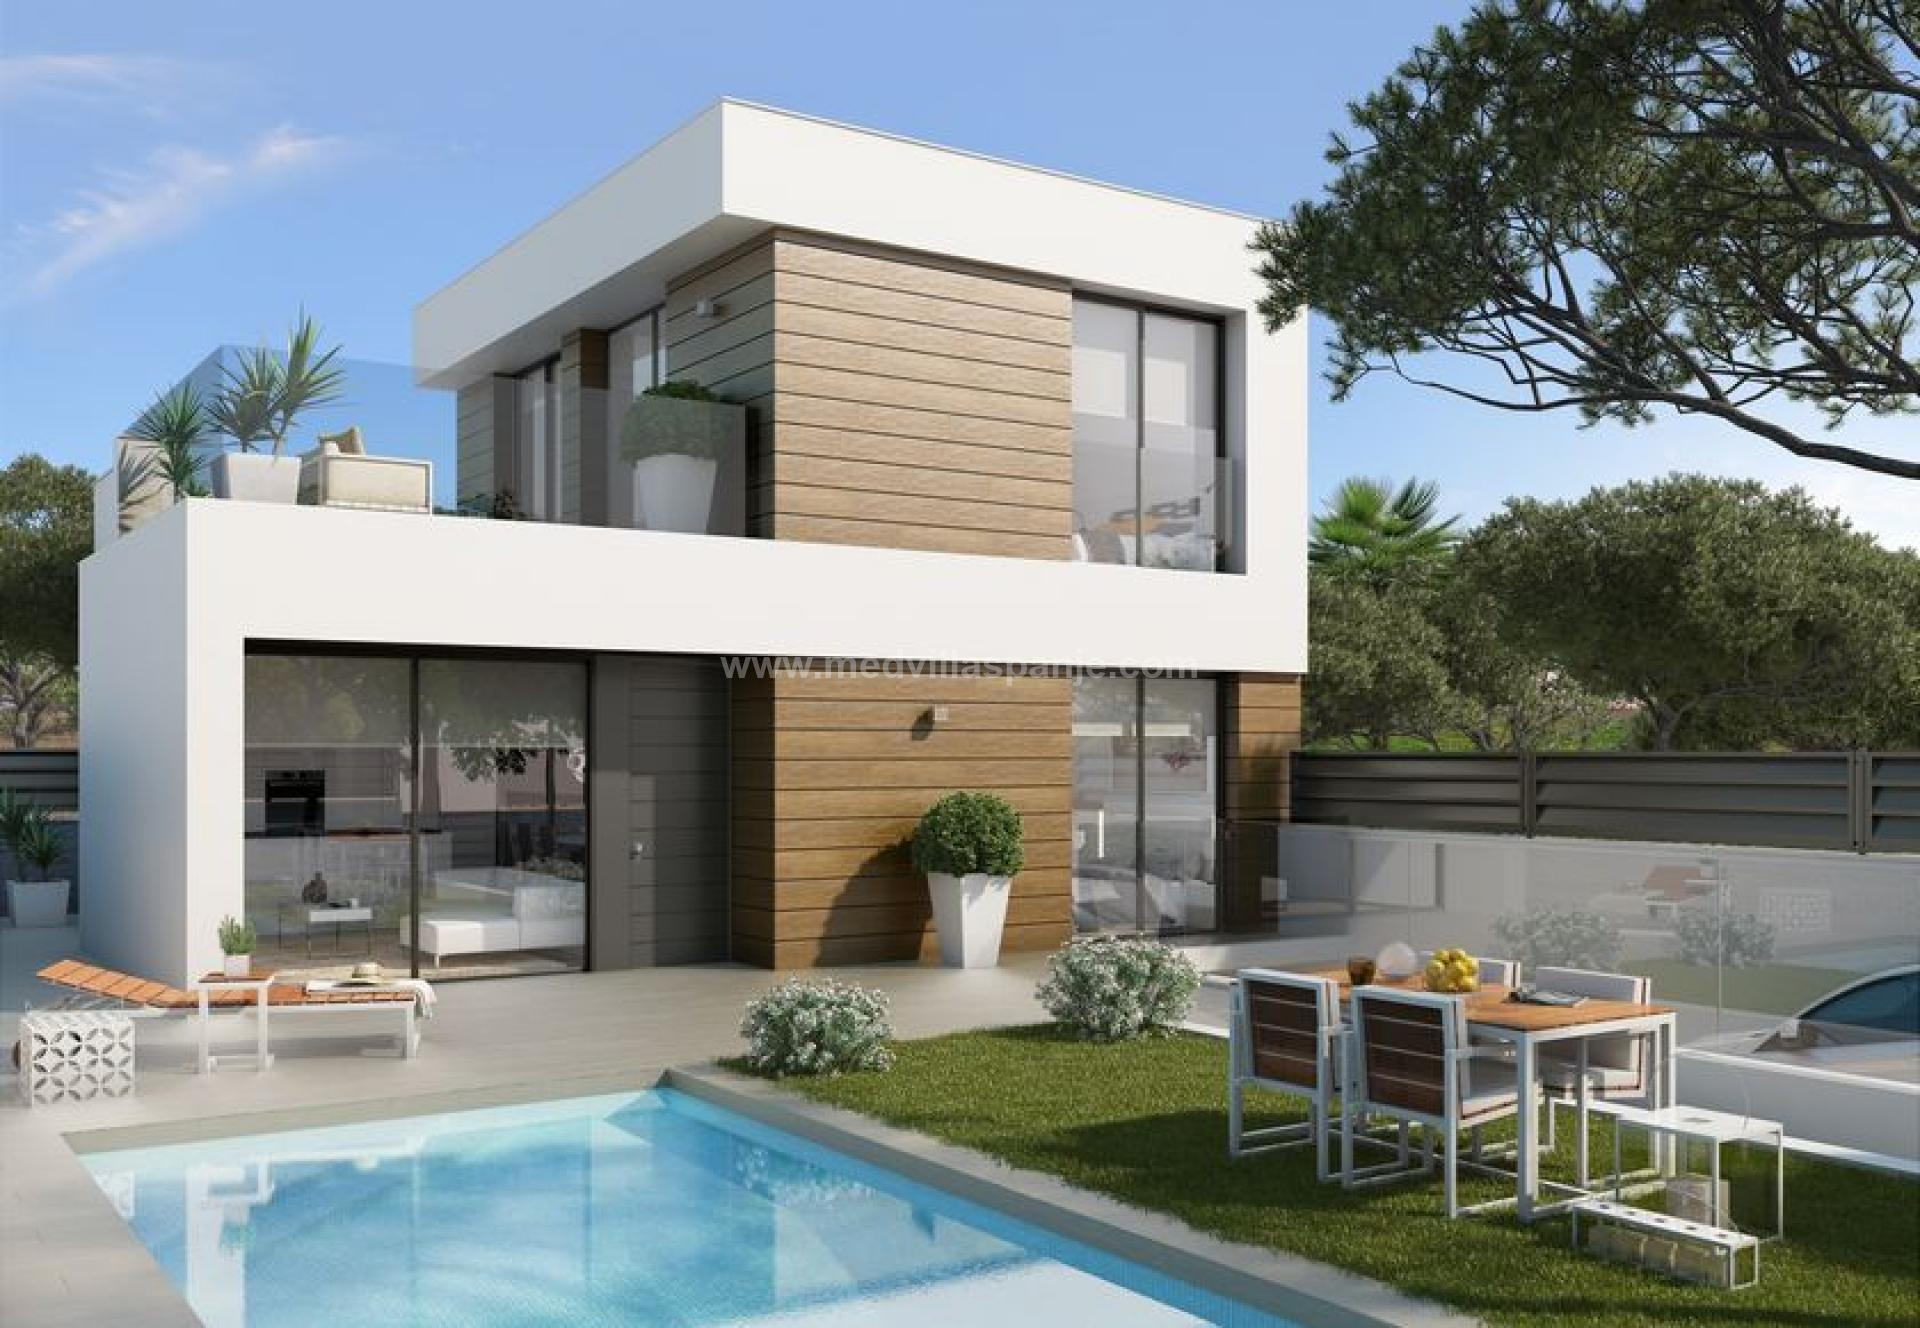 3 bedroom Villa in El Campello - New build in Medvilla Spanje